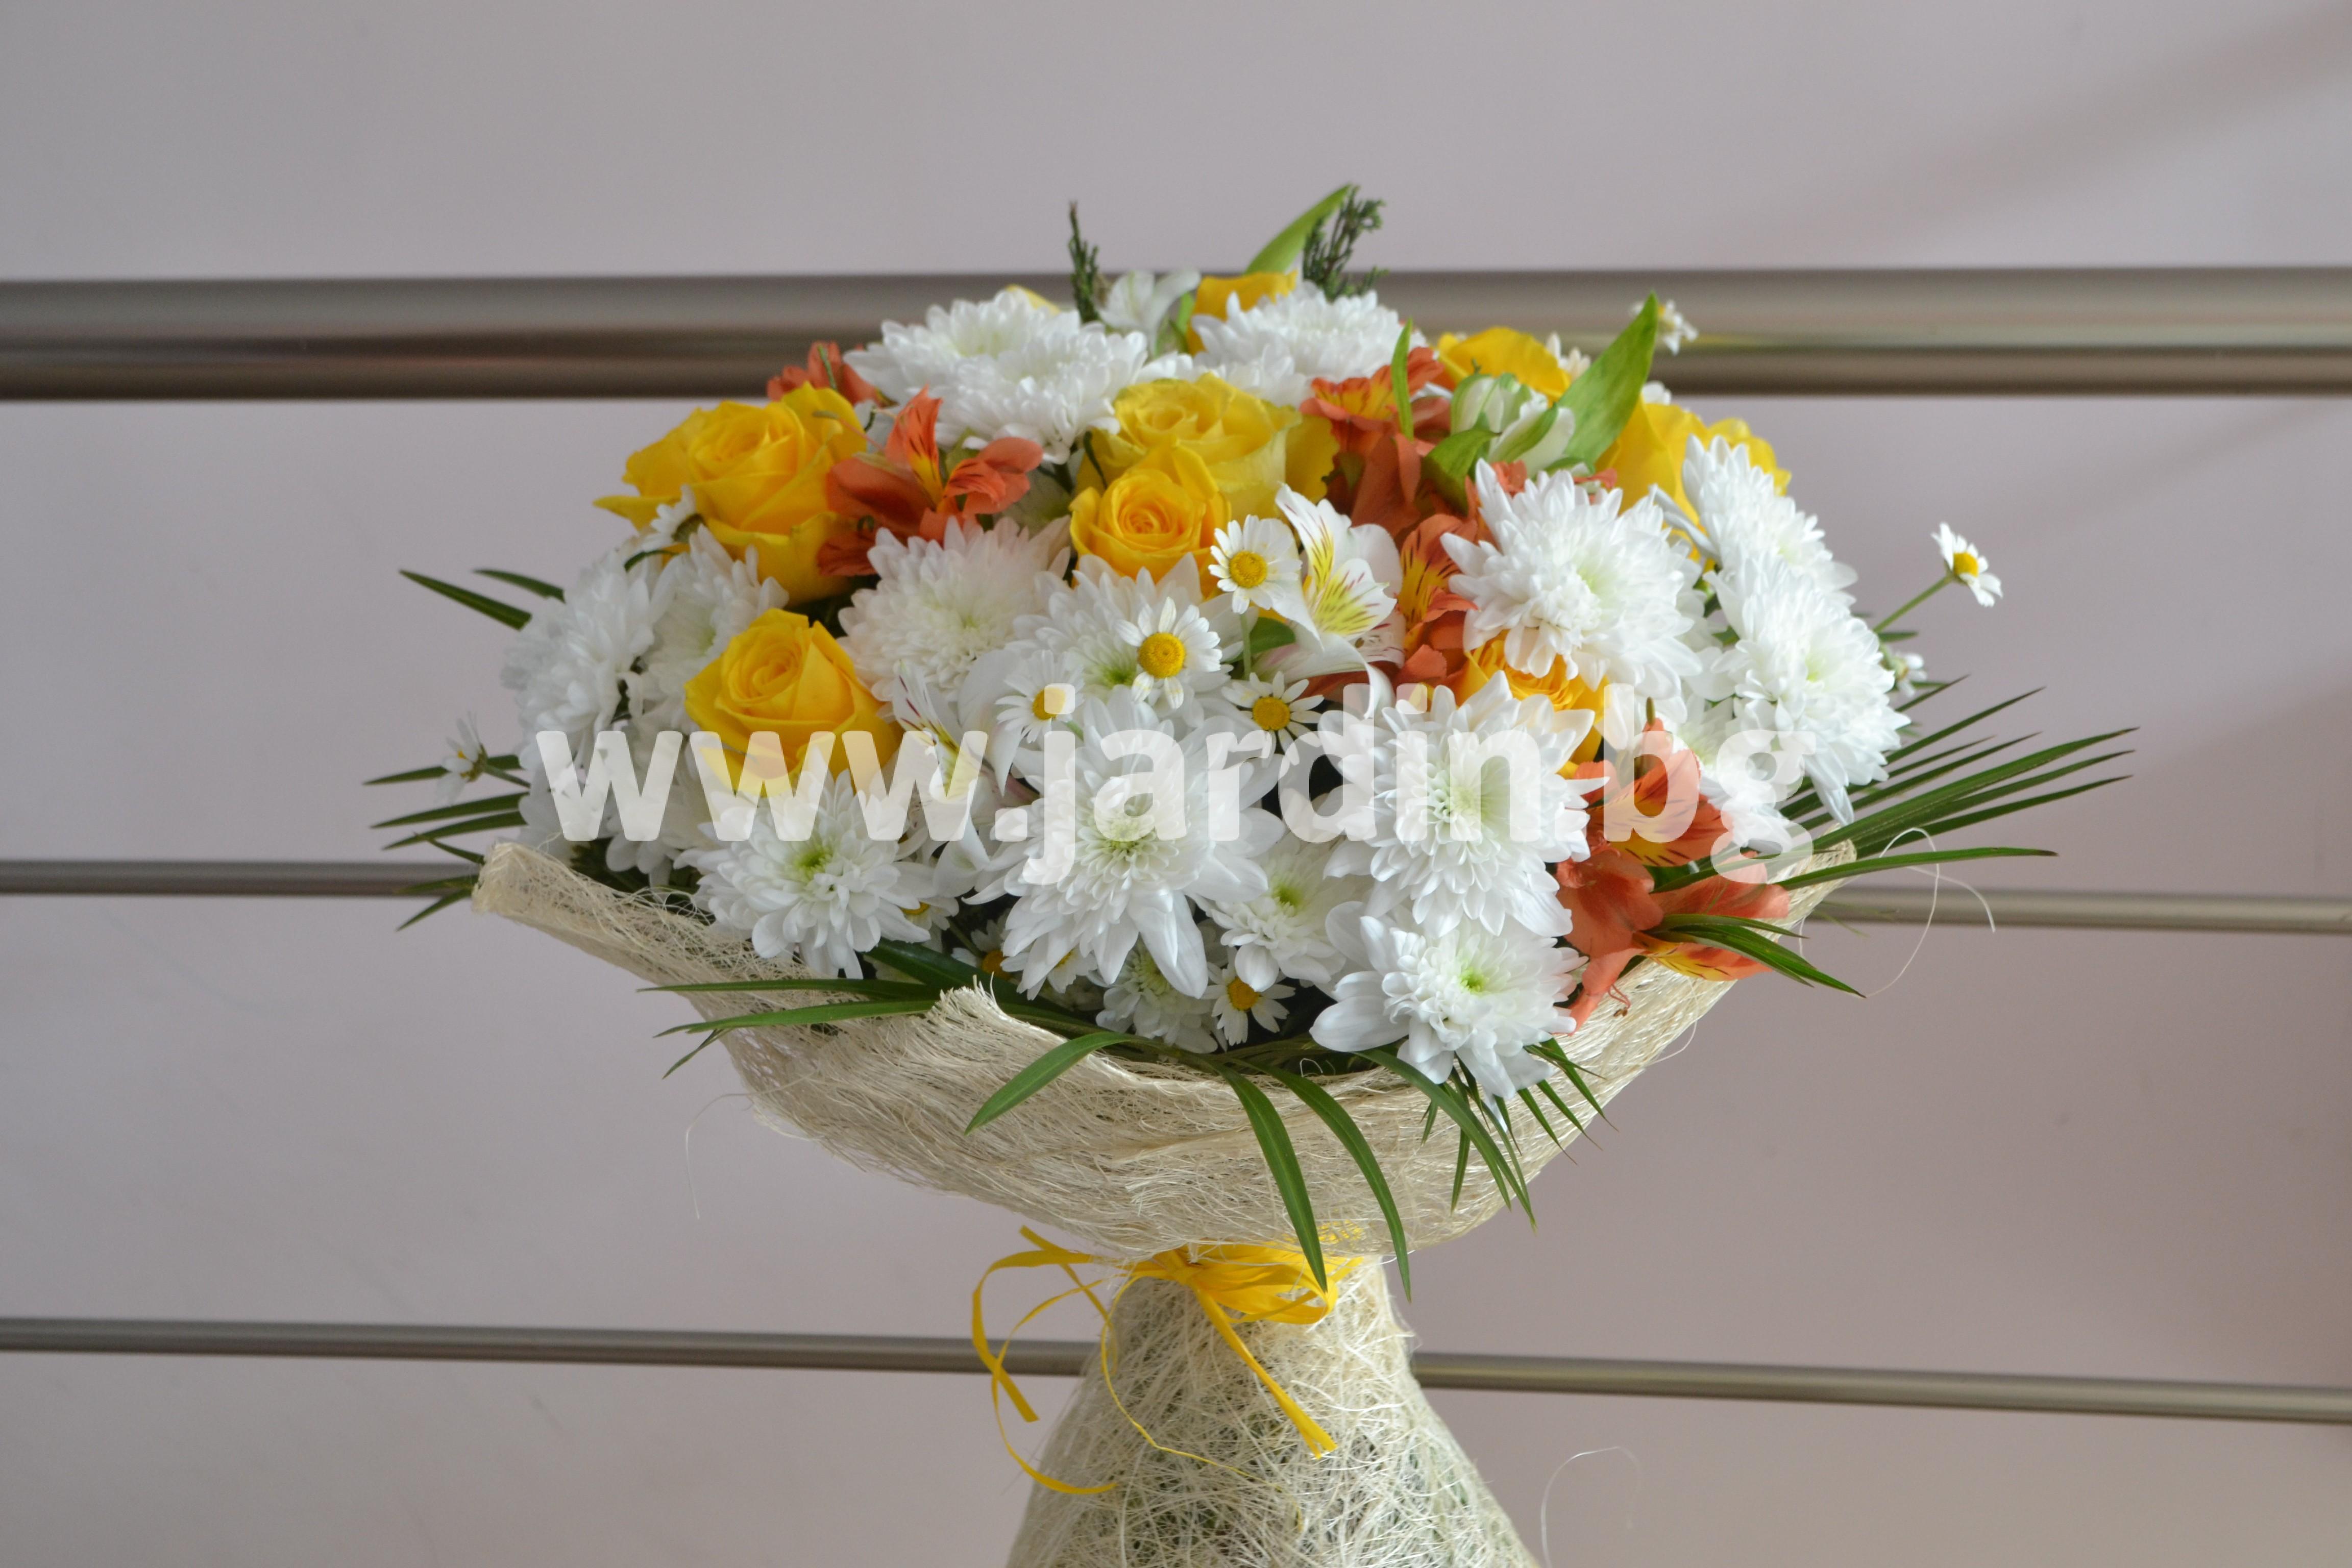 bouquet-roses-alstroеmerias-hrizanthemums (4)